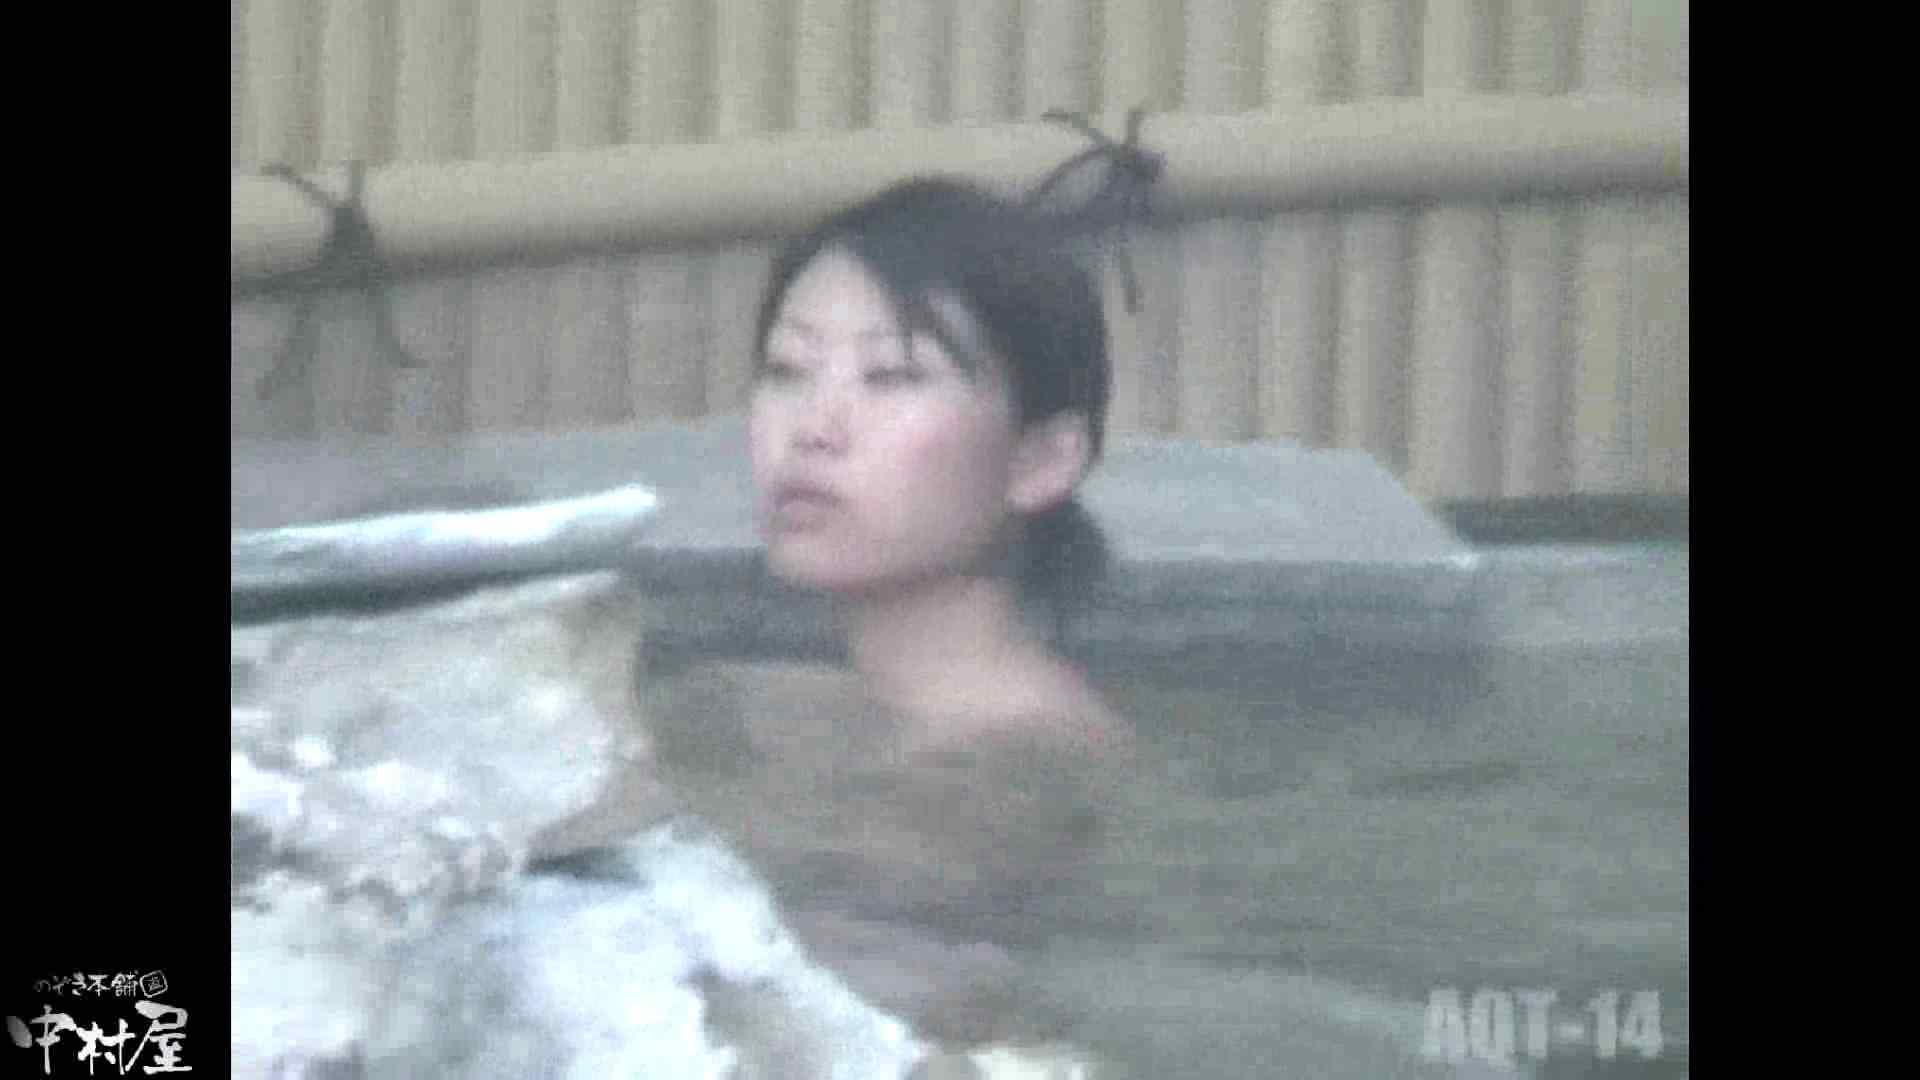 Aquaな露天風呂Vol.878潜入盗撮露天風呂十四判湯 其の一 潜入画像   露天  59画像 10